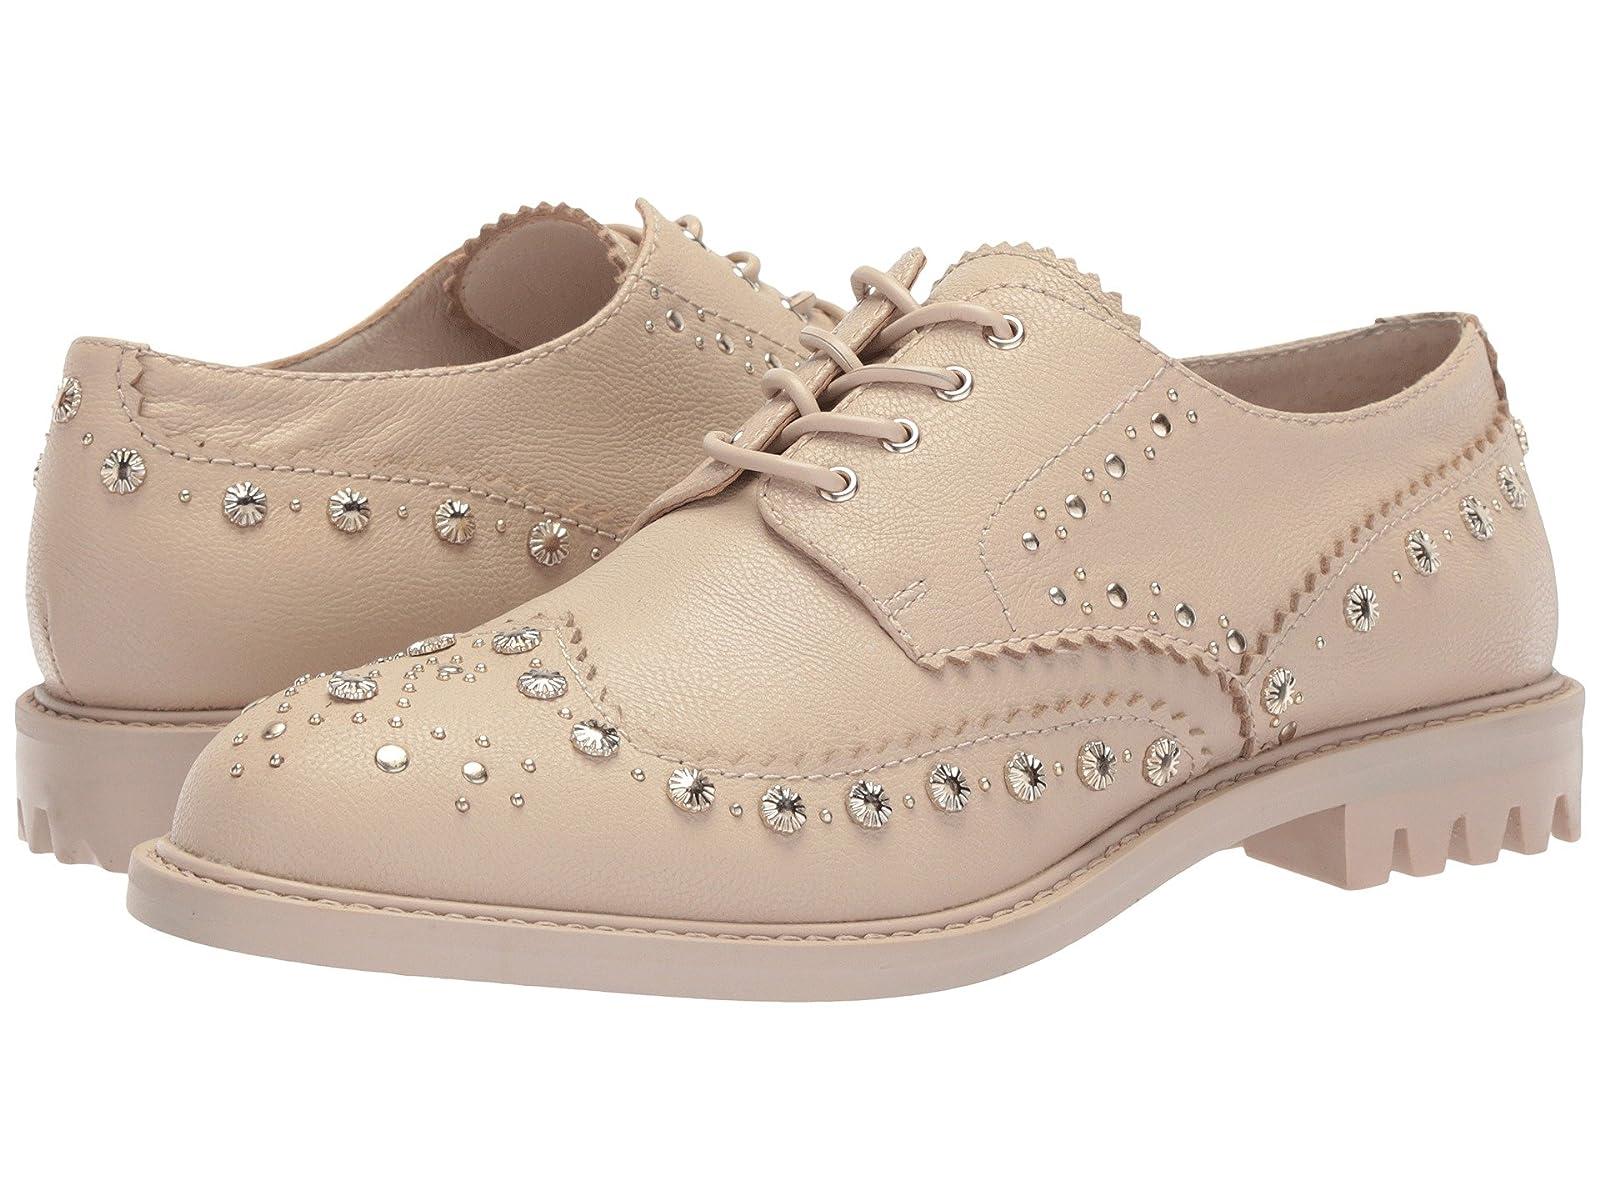 Kelsi Dagger Brooklyn Border LoaferCheap and distinctive eye-catching shoes